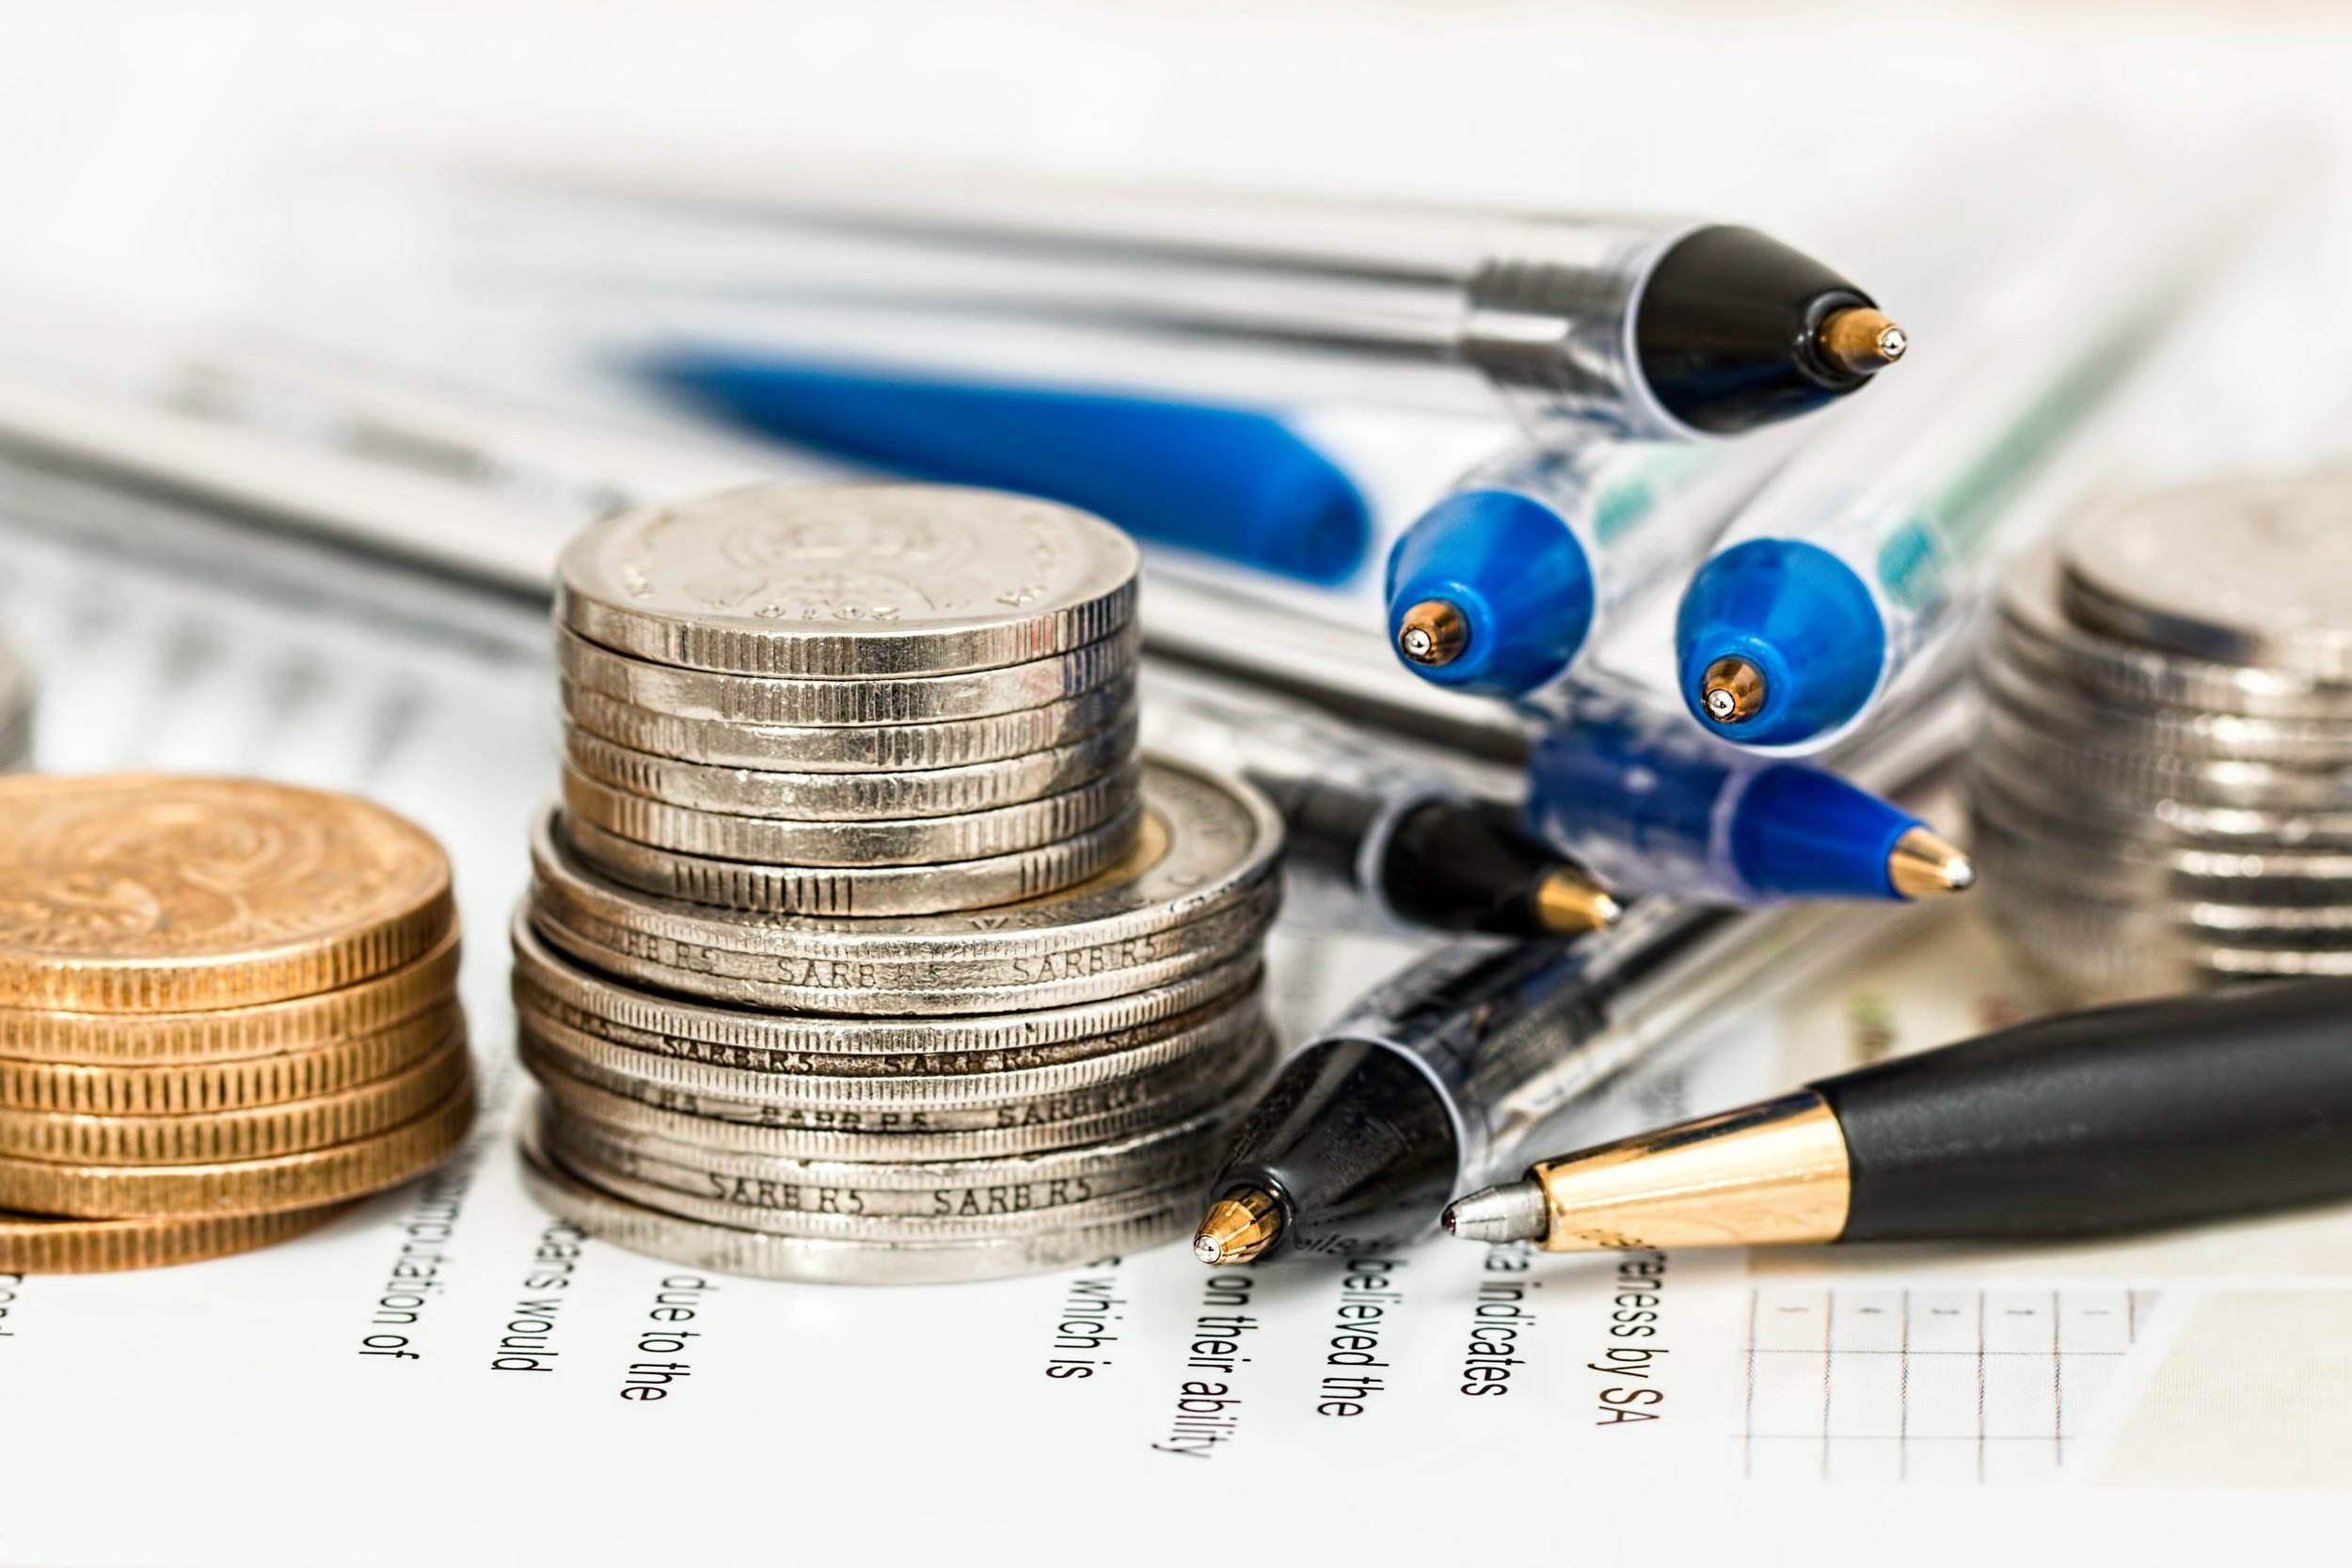 pens-money-papers.jpg